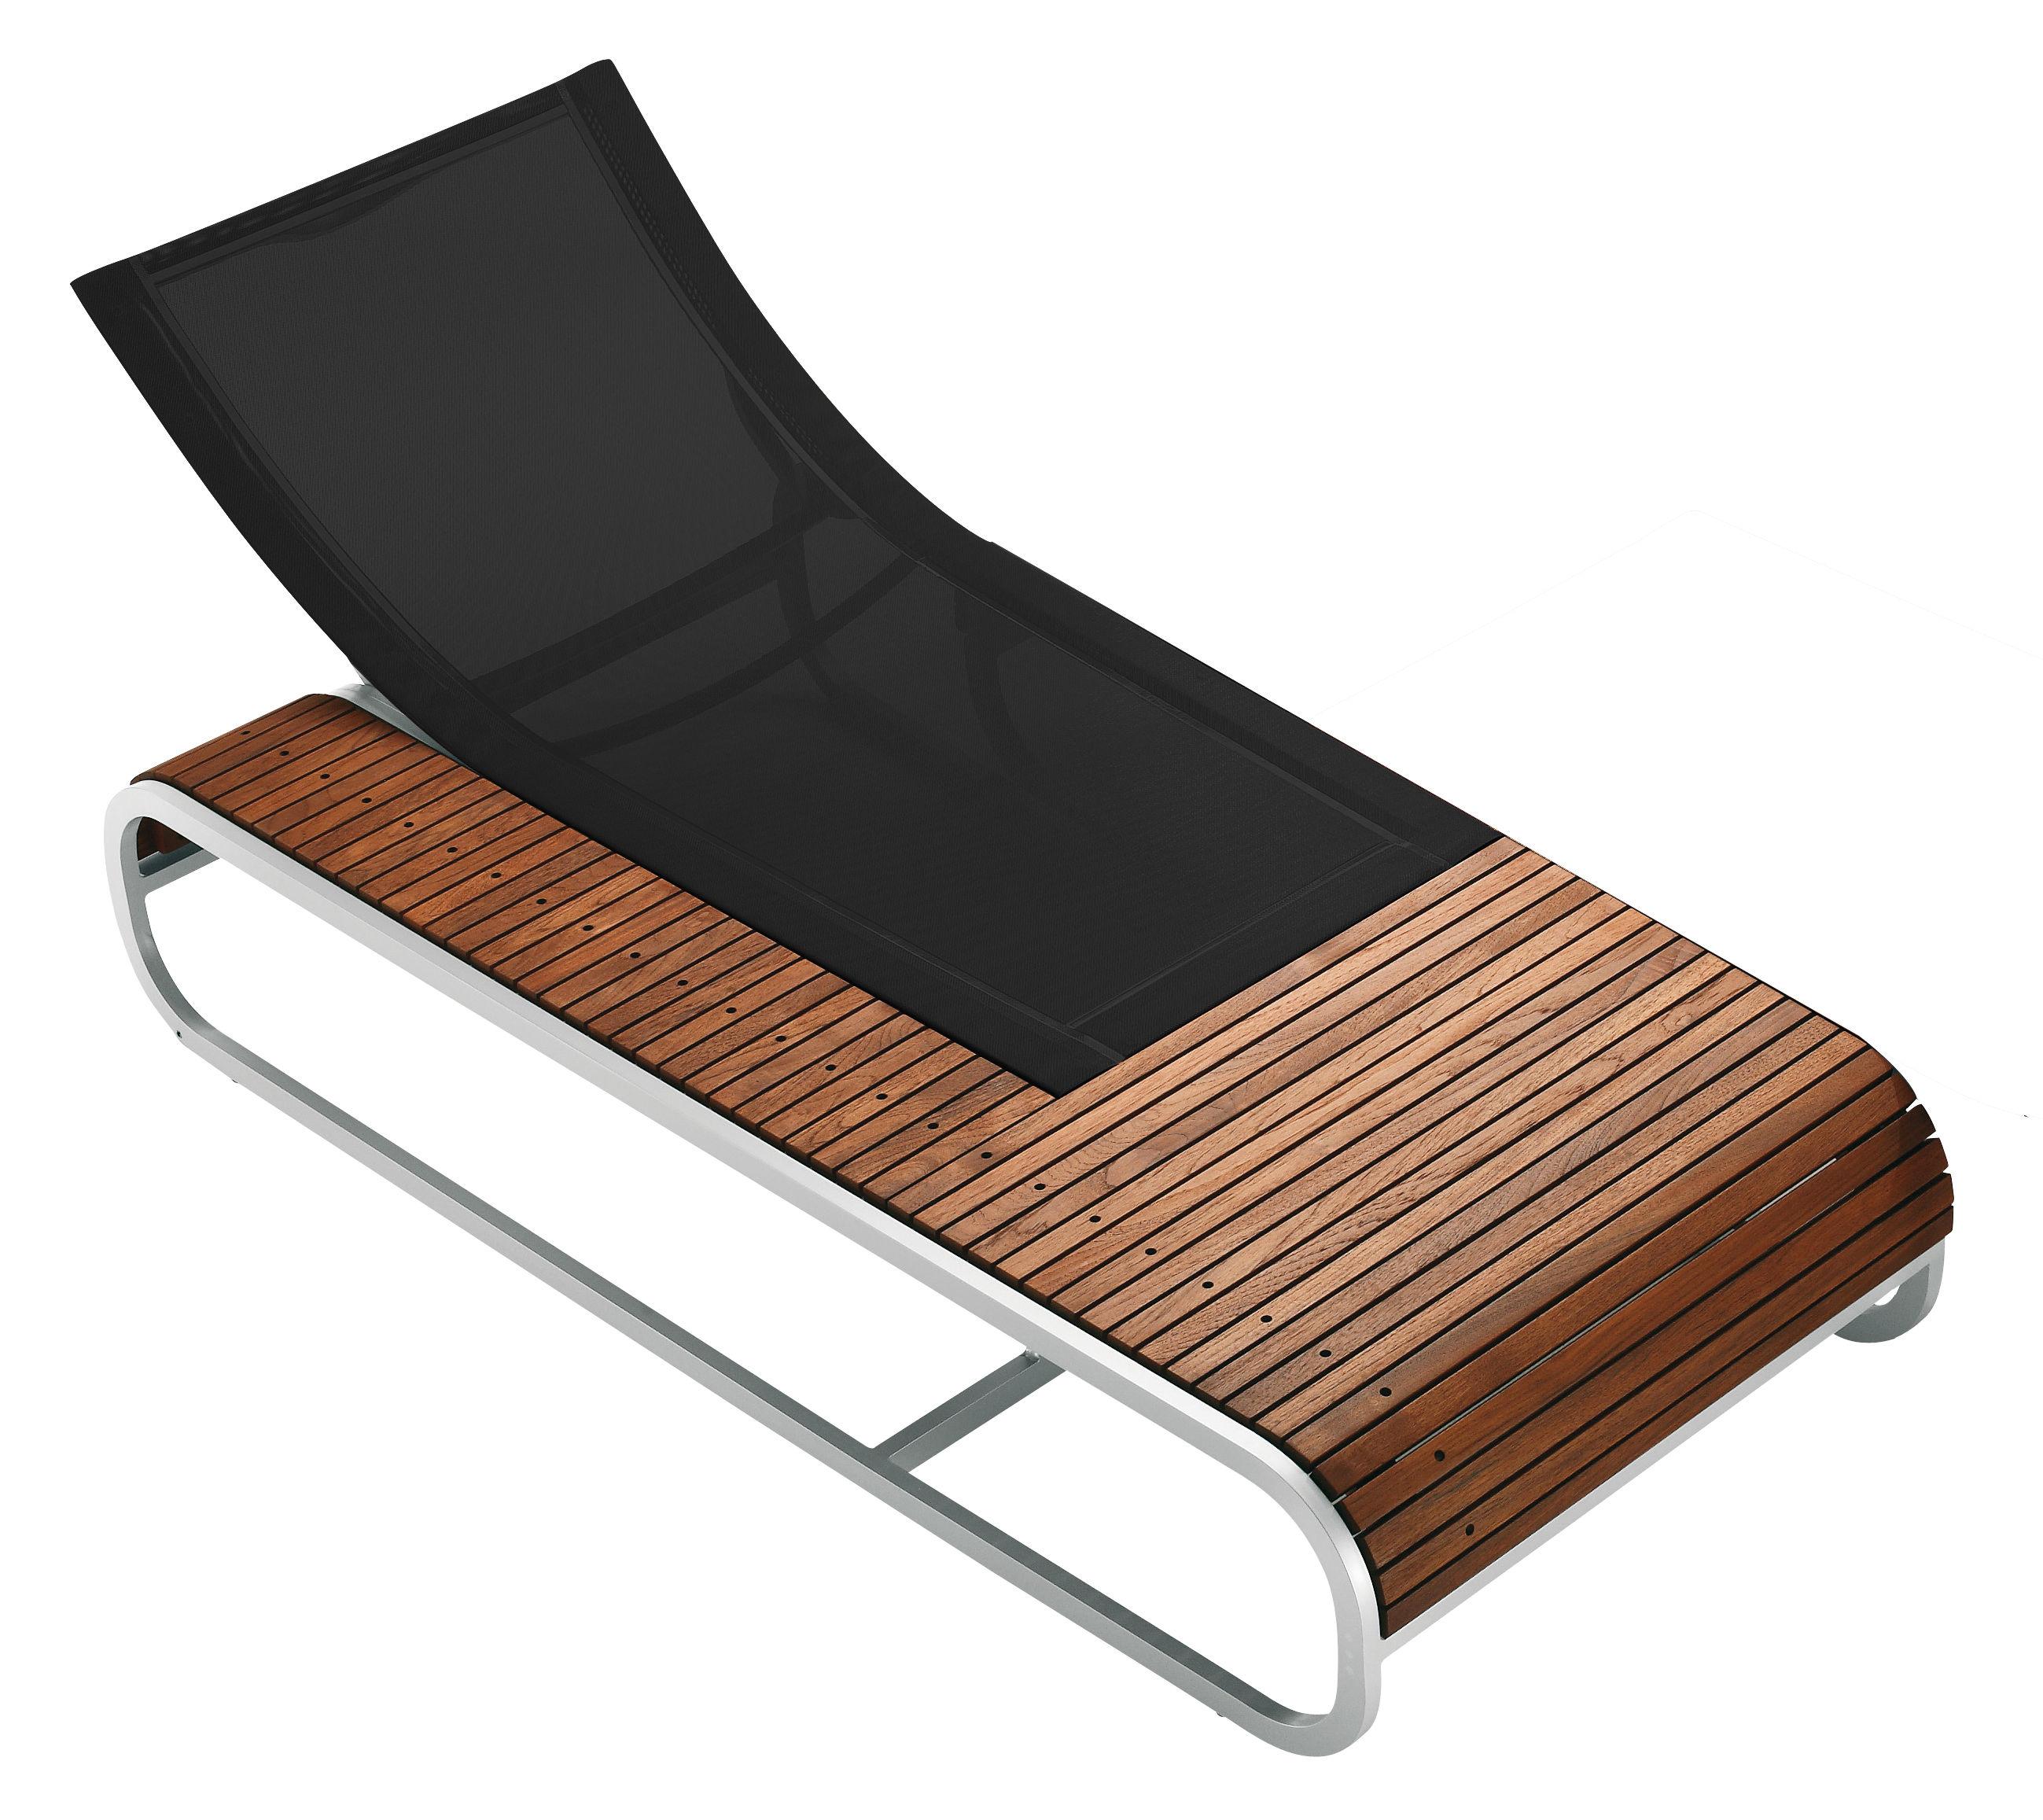 Outdoor - Sun Loungers & Hammocks - Tandem Reclining chair - Teak version by EGO Paris - Teck / Black fabric - Batyline cloth, Lacquered aluminium, Teak